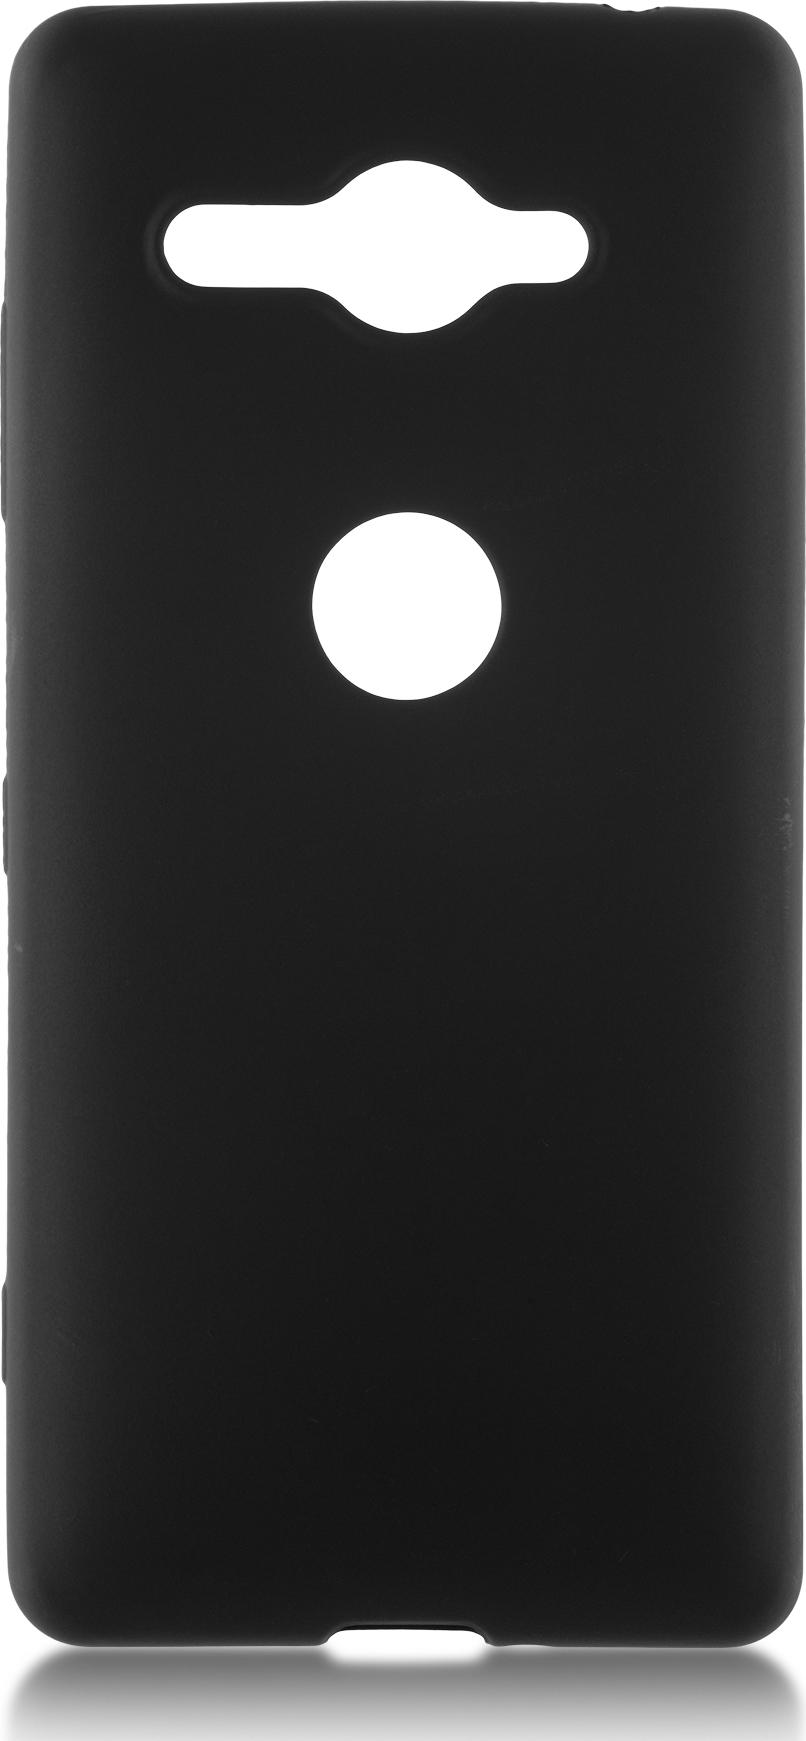 Чехол Brosco Colourful для Sony Xperia XZ2 Compact, черный